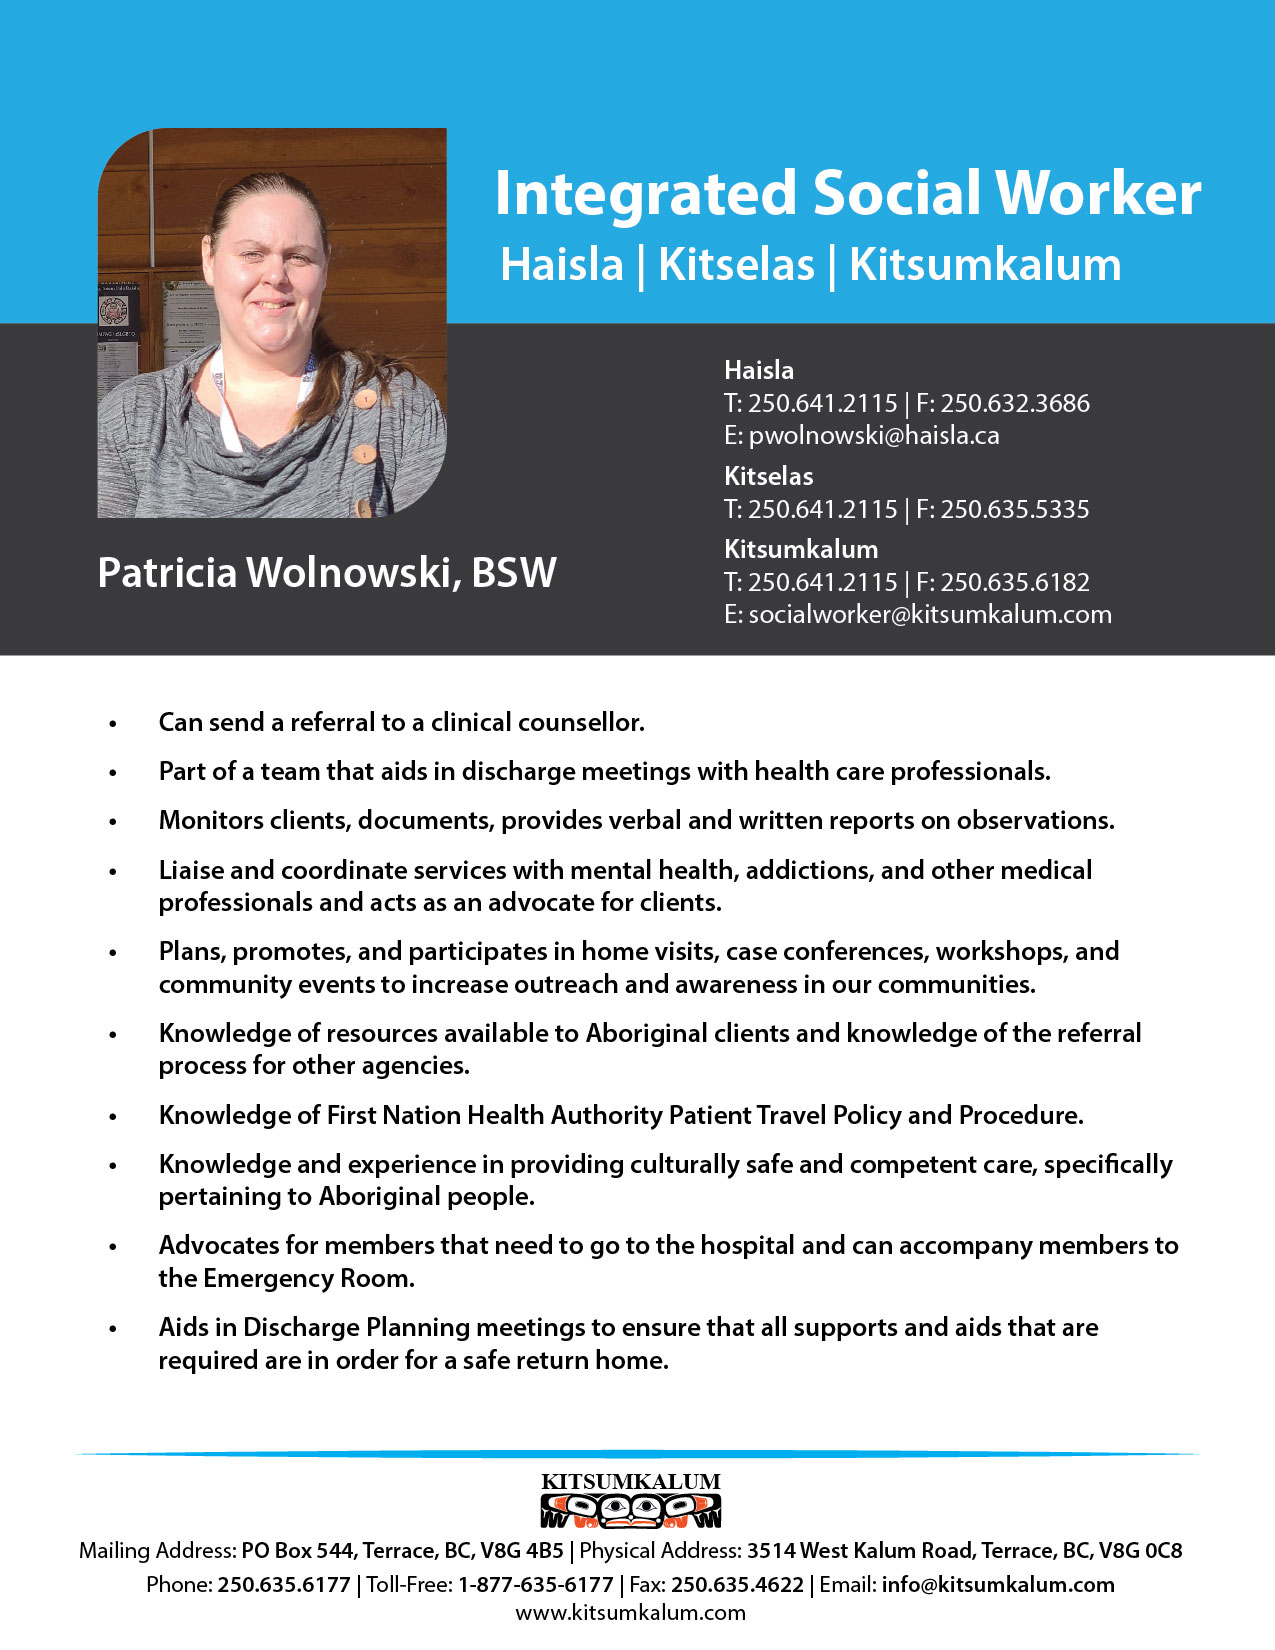 Integrated Social Worker for Haisla, Kitselas and Kitsumkalum